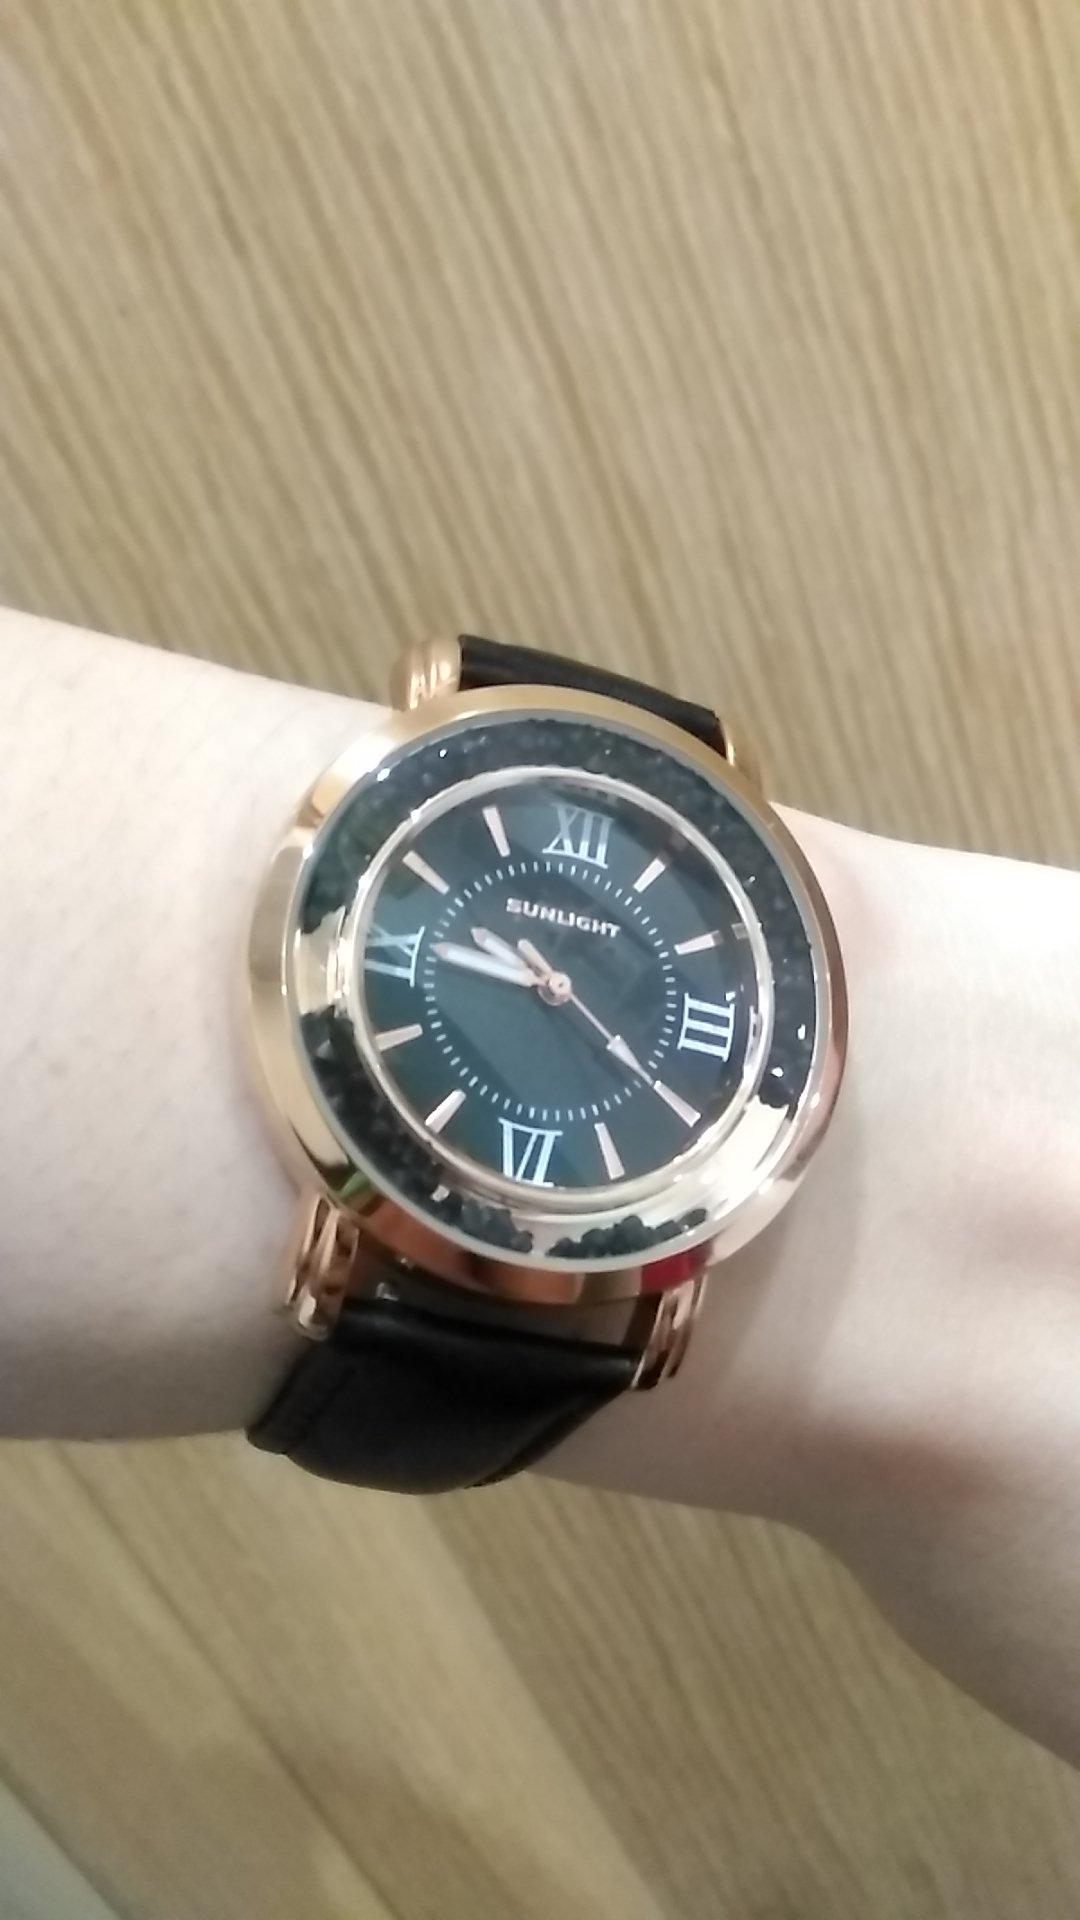 Презентабельные женственные часы